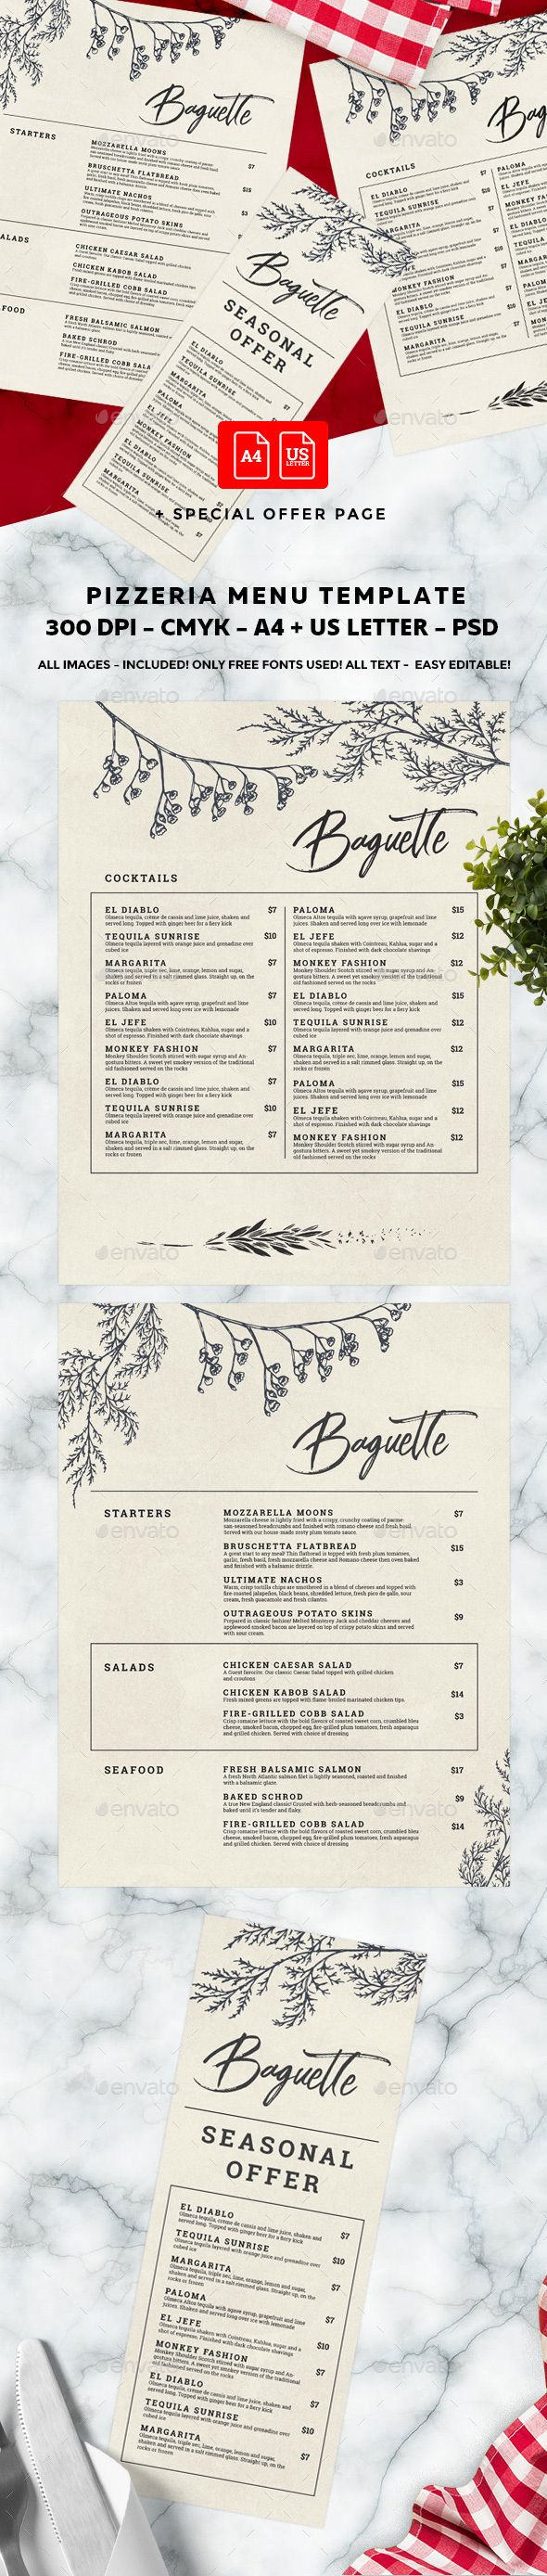 elegant menu | restaurant menu template & design | pinterest | menu